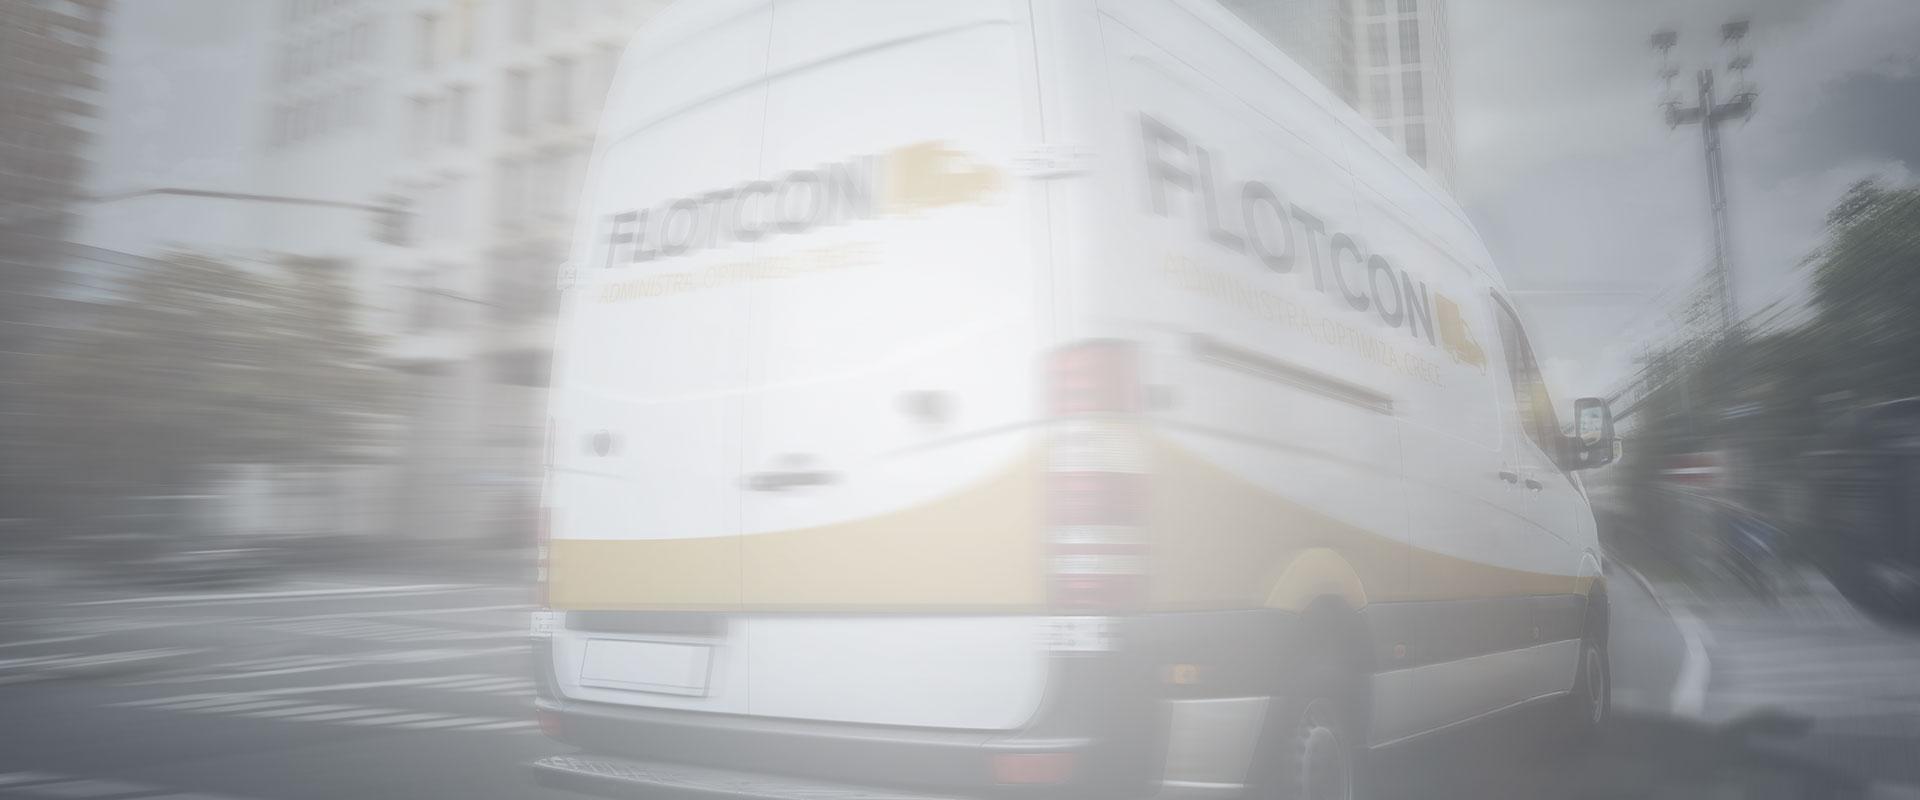 Flotcon